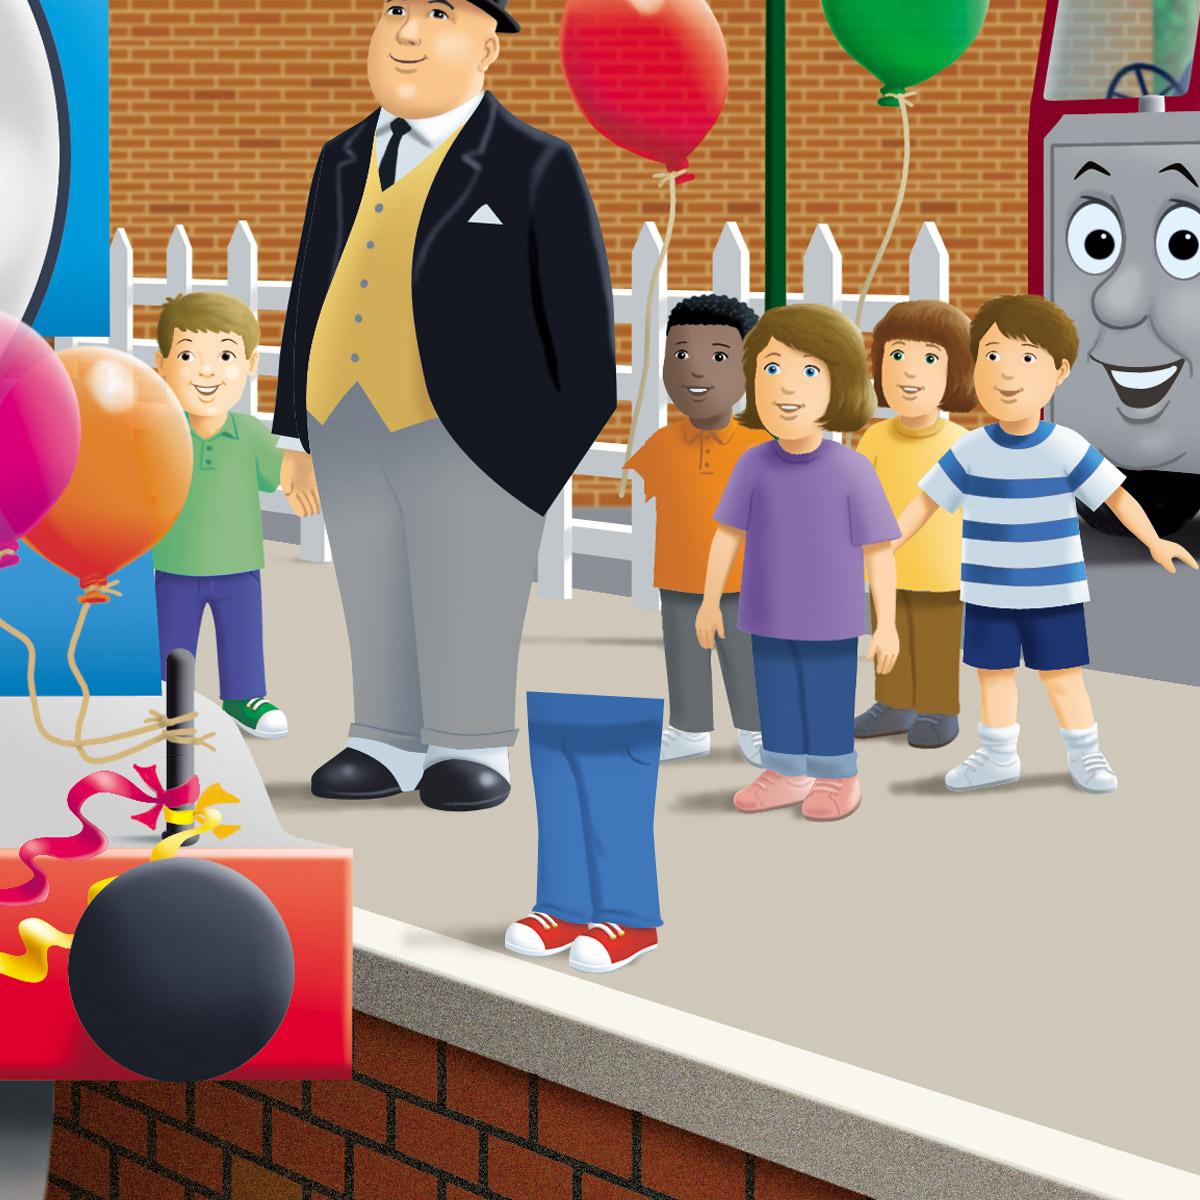 Thomas The Tank Engine Personalised Children's Birthday